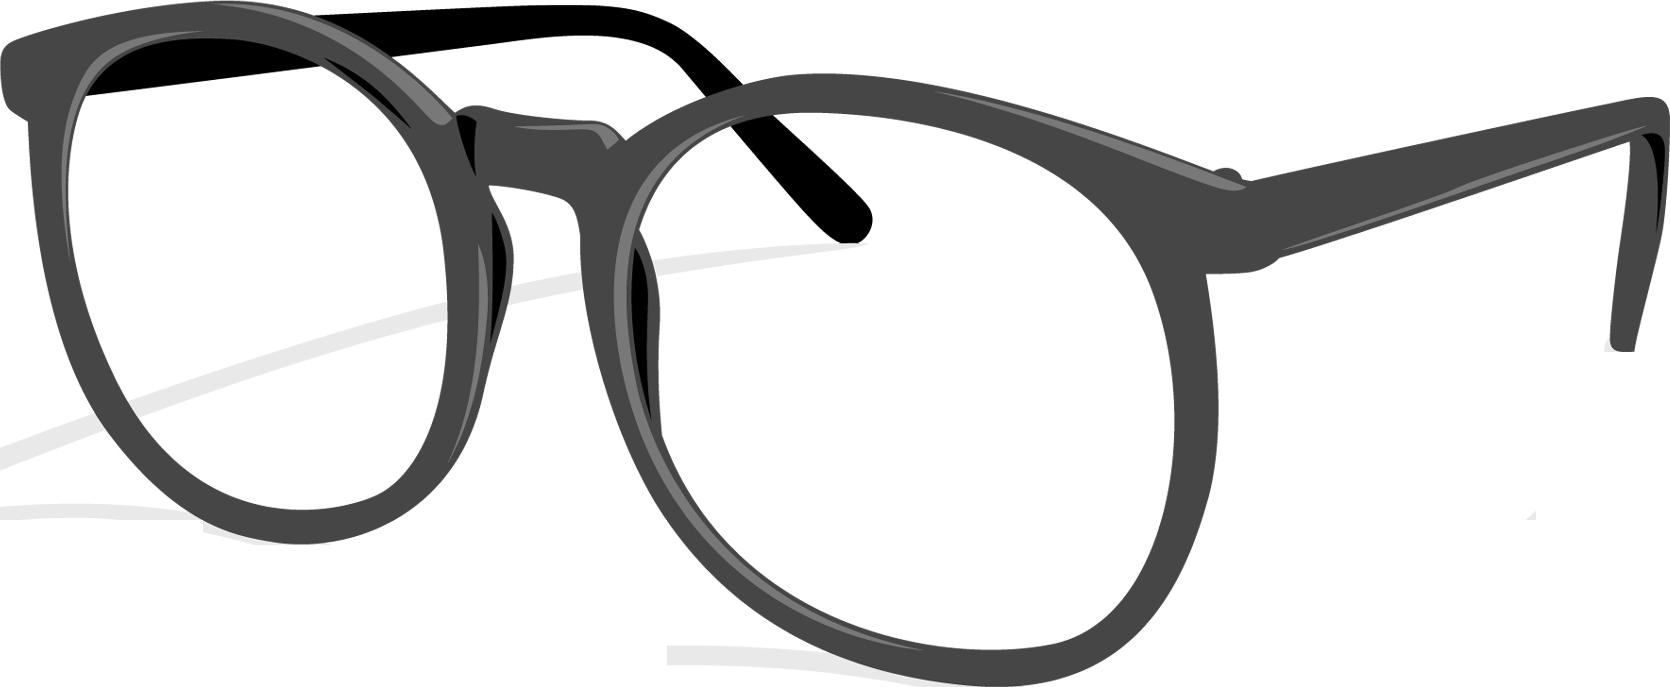 Eyeglasses eyeglass clipart